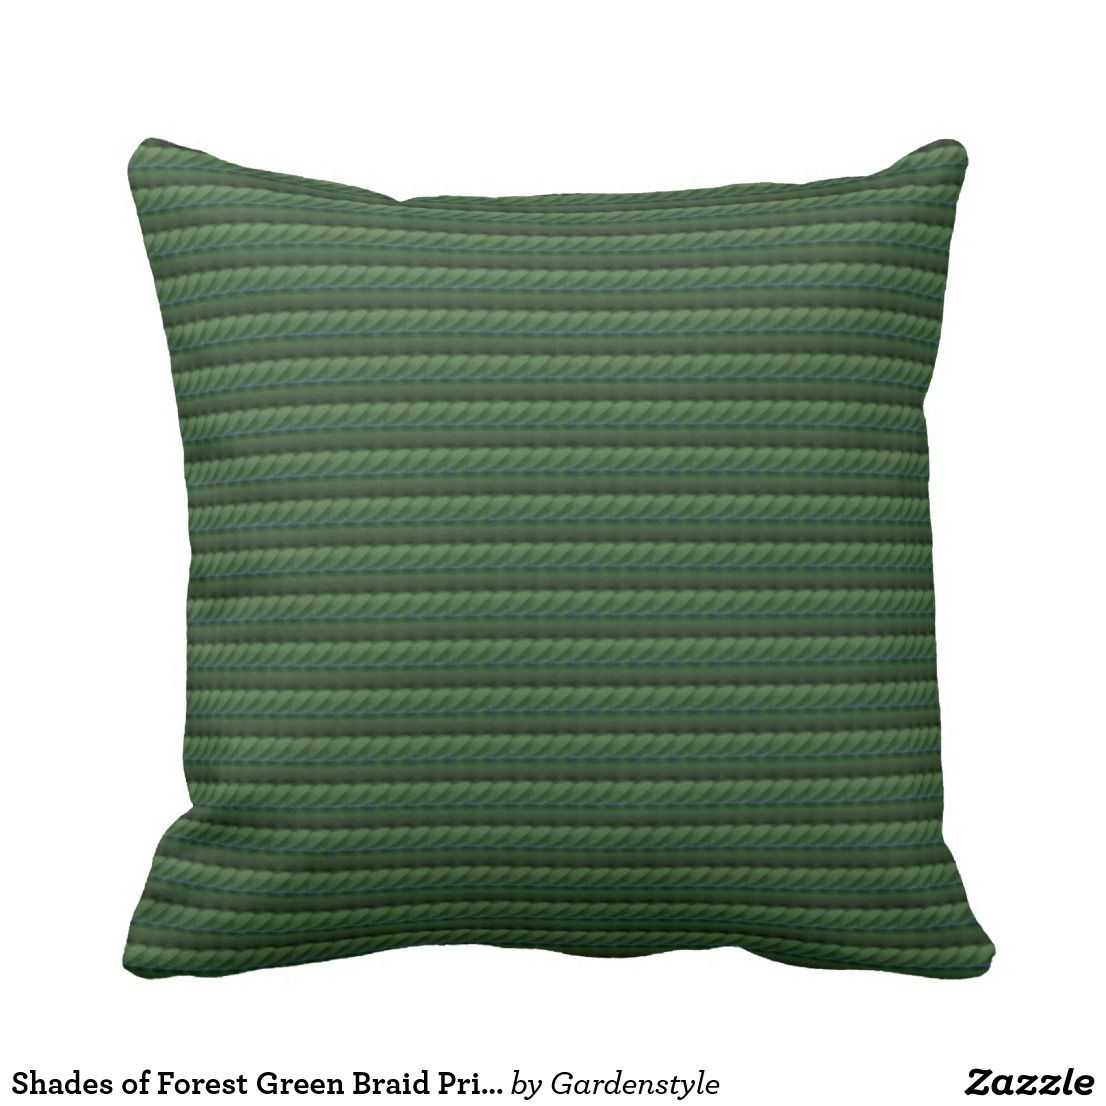 Shades Of Forest Green Braid Print Pillow 16 X16 Throw Pillows Green Pillows Decorative Printed Throw Pillows